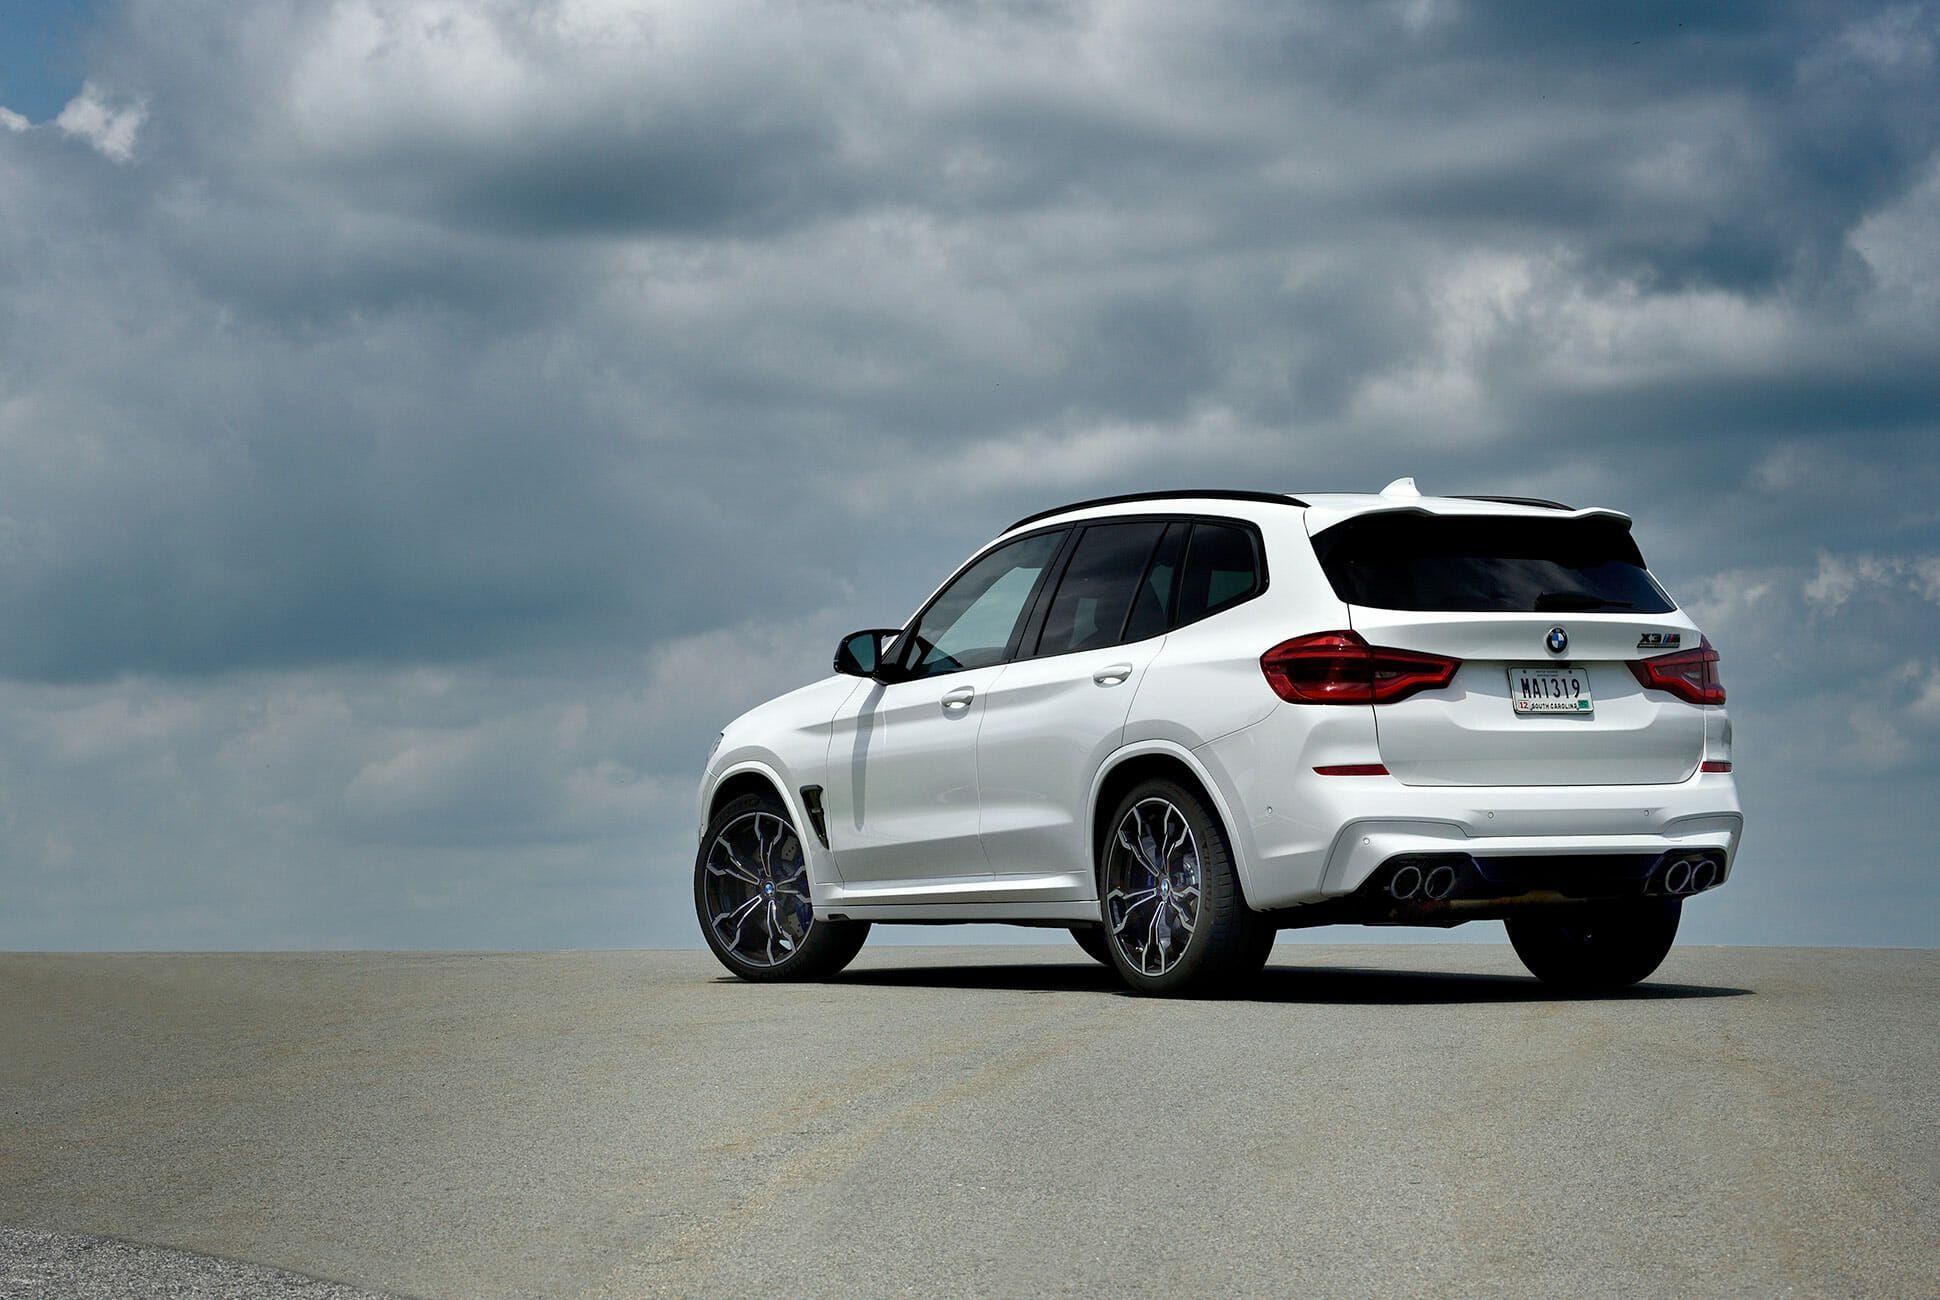 2020-BMW-X3-M-X4-M-Review-gear-patrol-slide-2